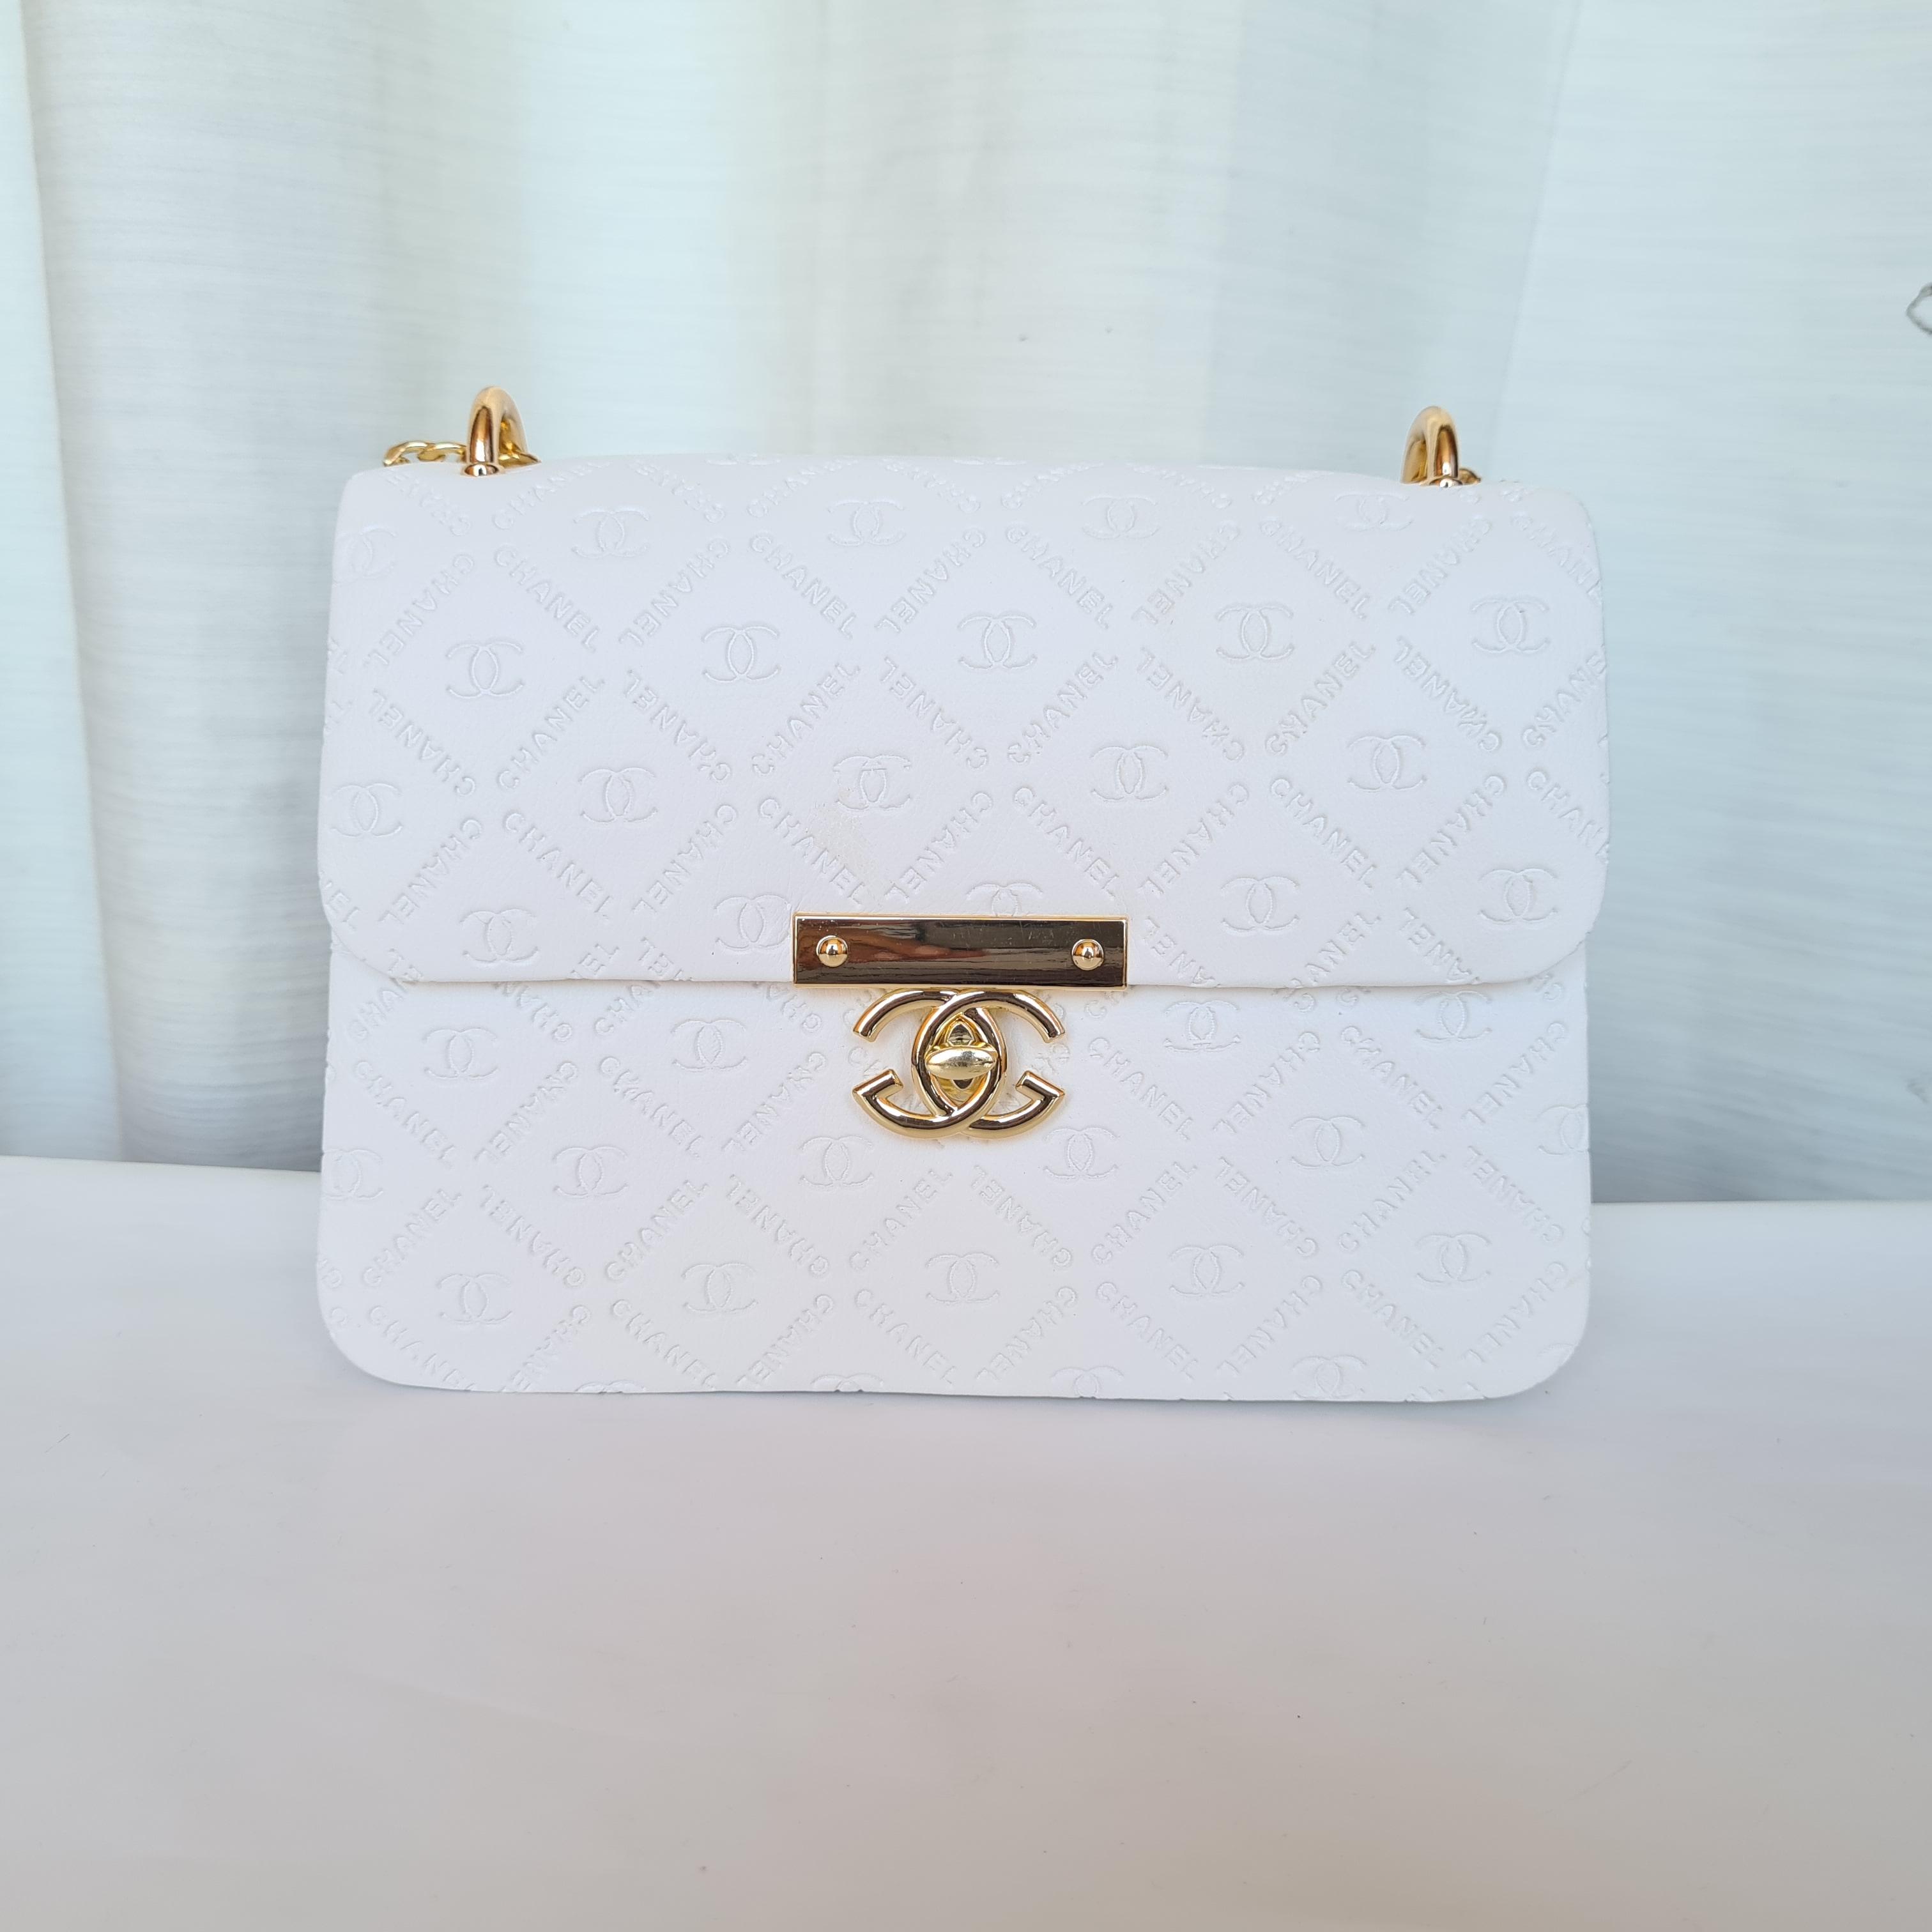 Chanel Ladies Stylish Small Hand Bags QB00180